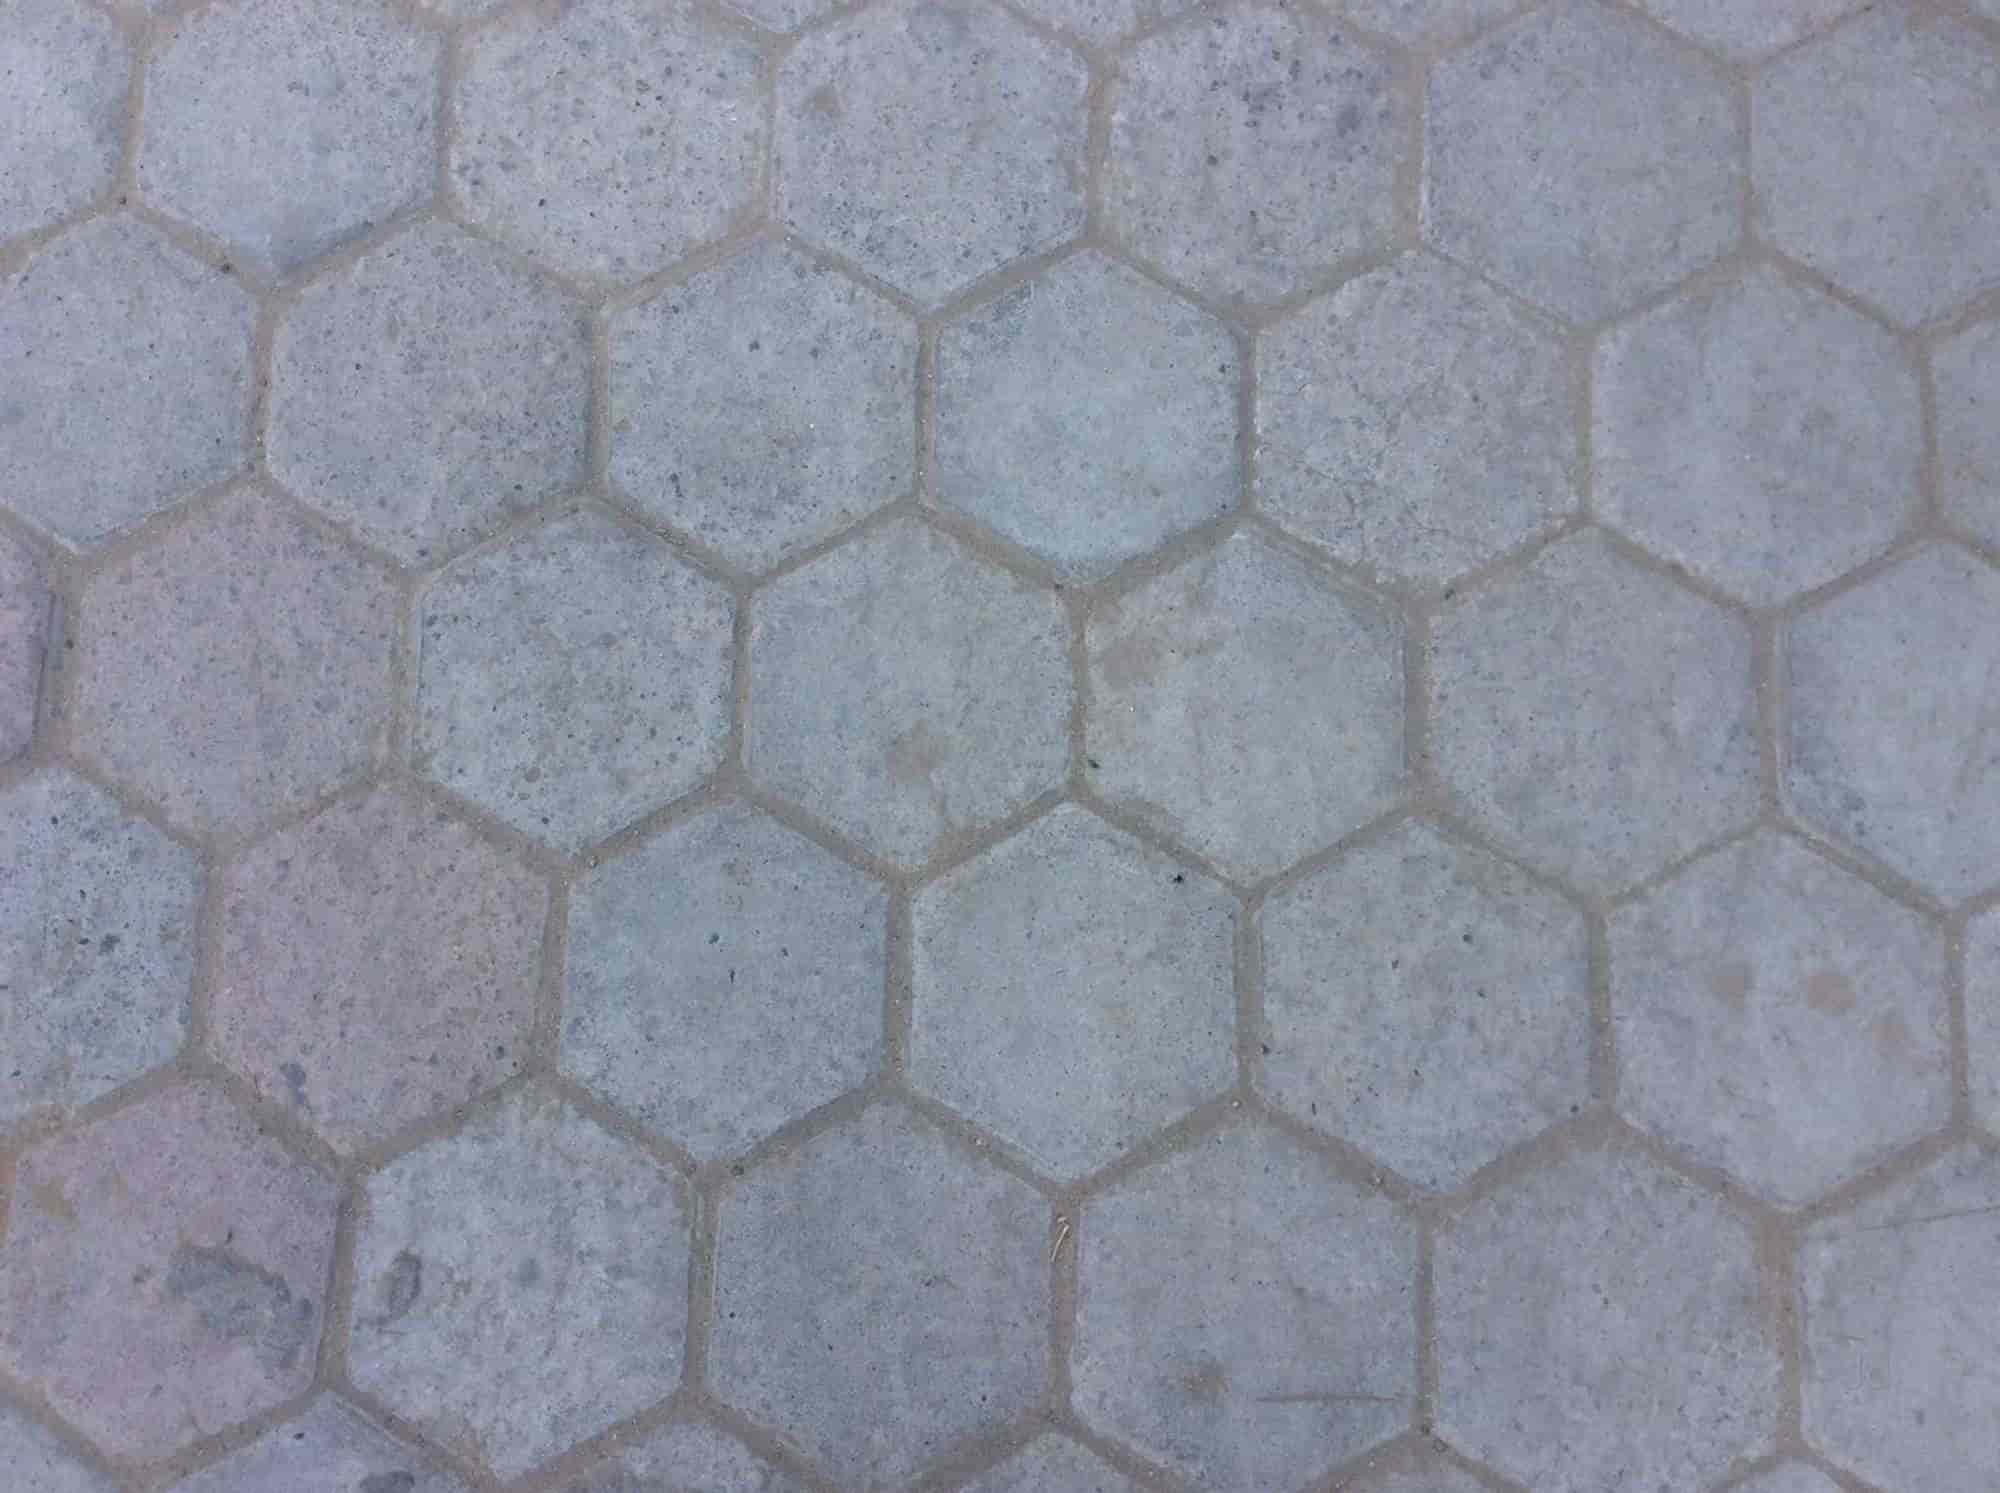 Om Mosaic Tiles - Tile Manufacturers in Ajmer - Justdial